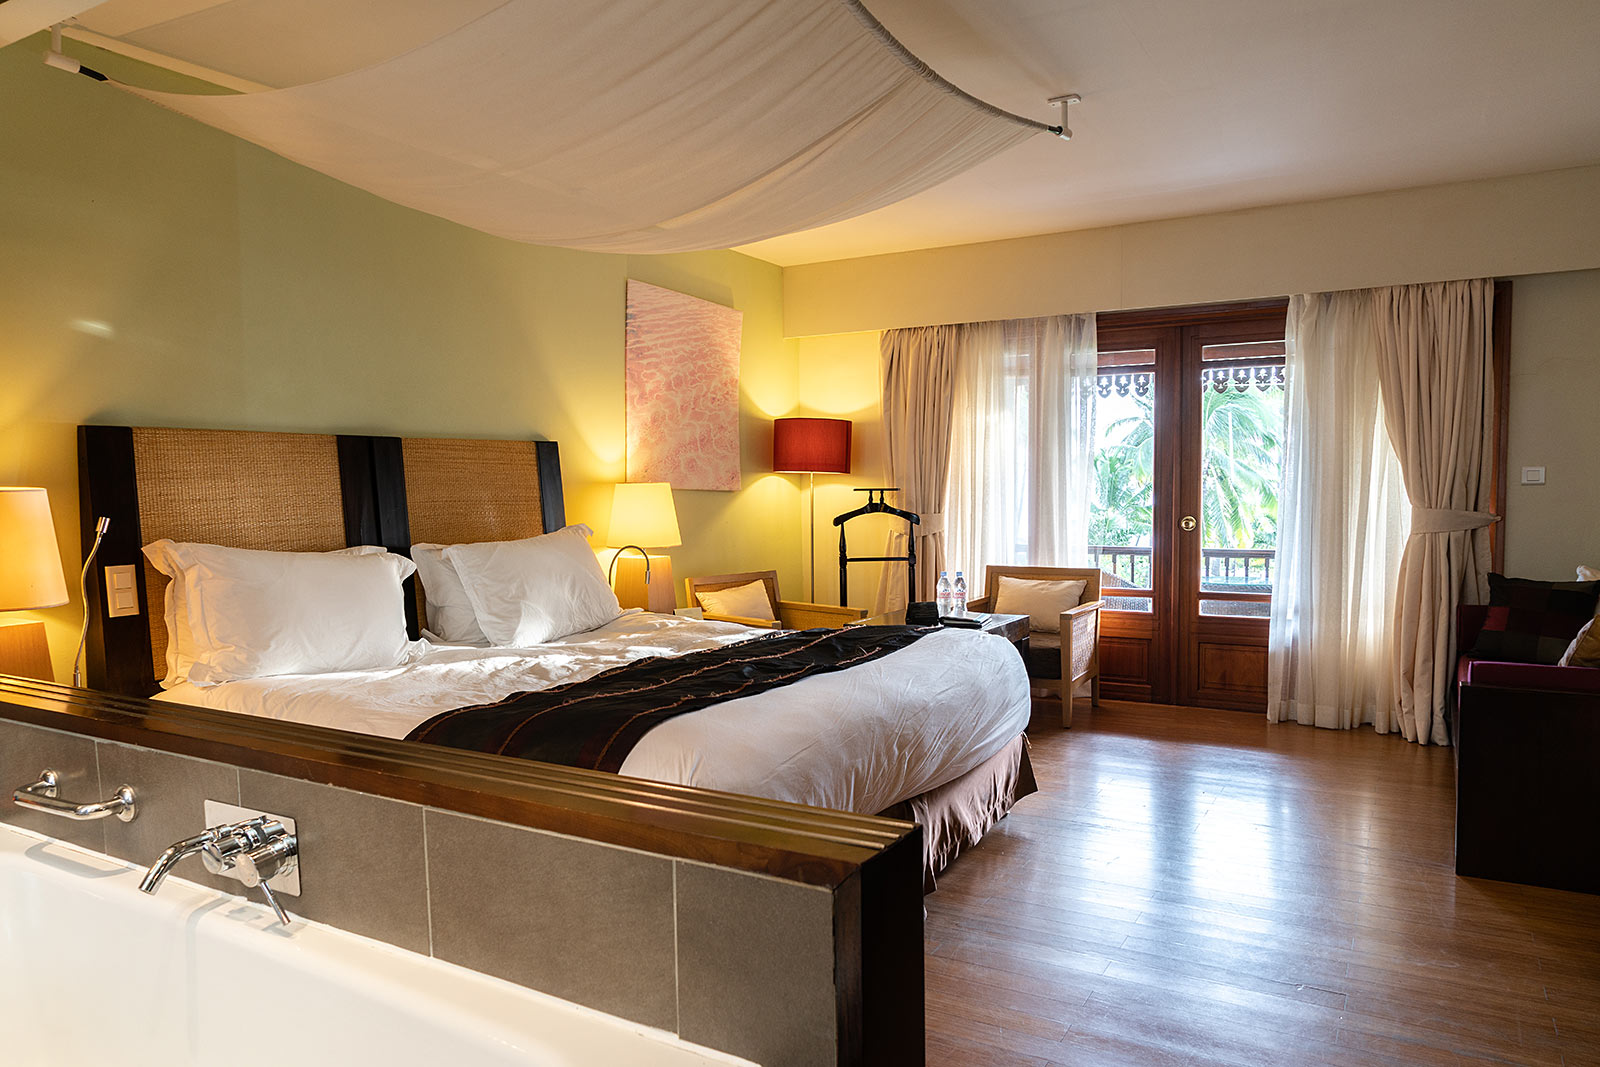 hotel sofitel mauritius zimmer doppelzimmer meerblick travel blog sunnyinga